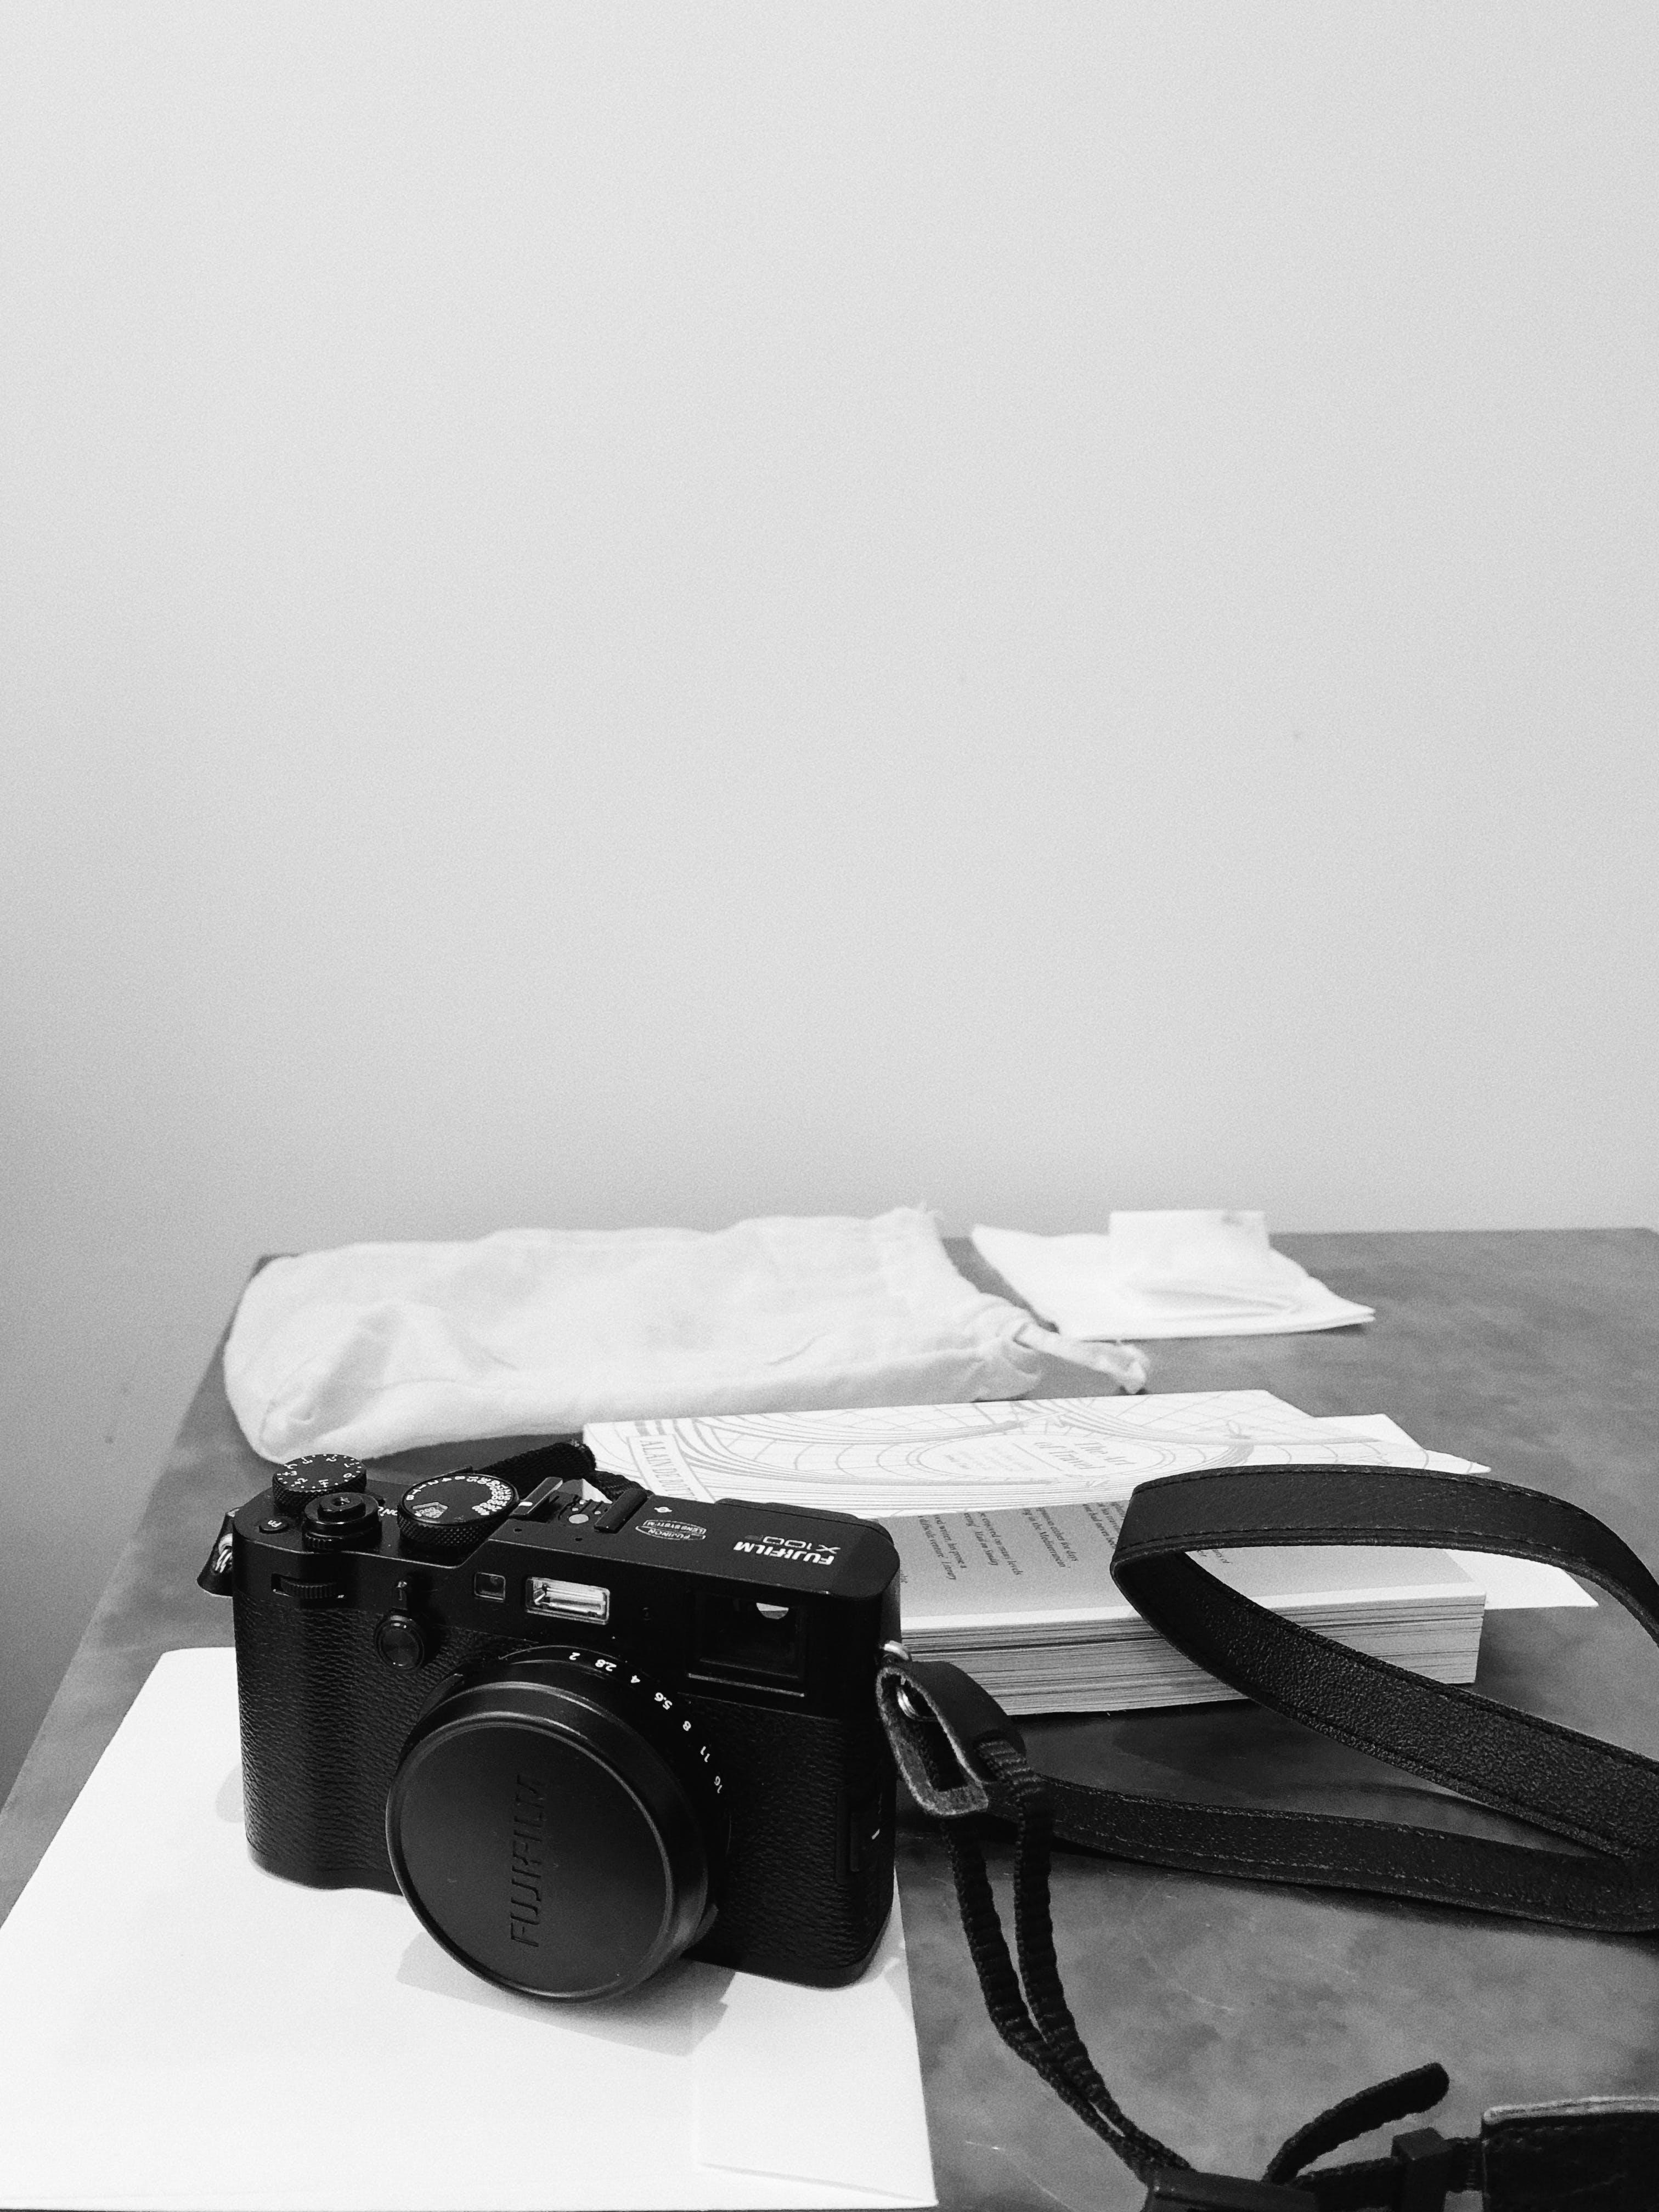 Black Slr Camera on Table